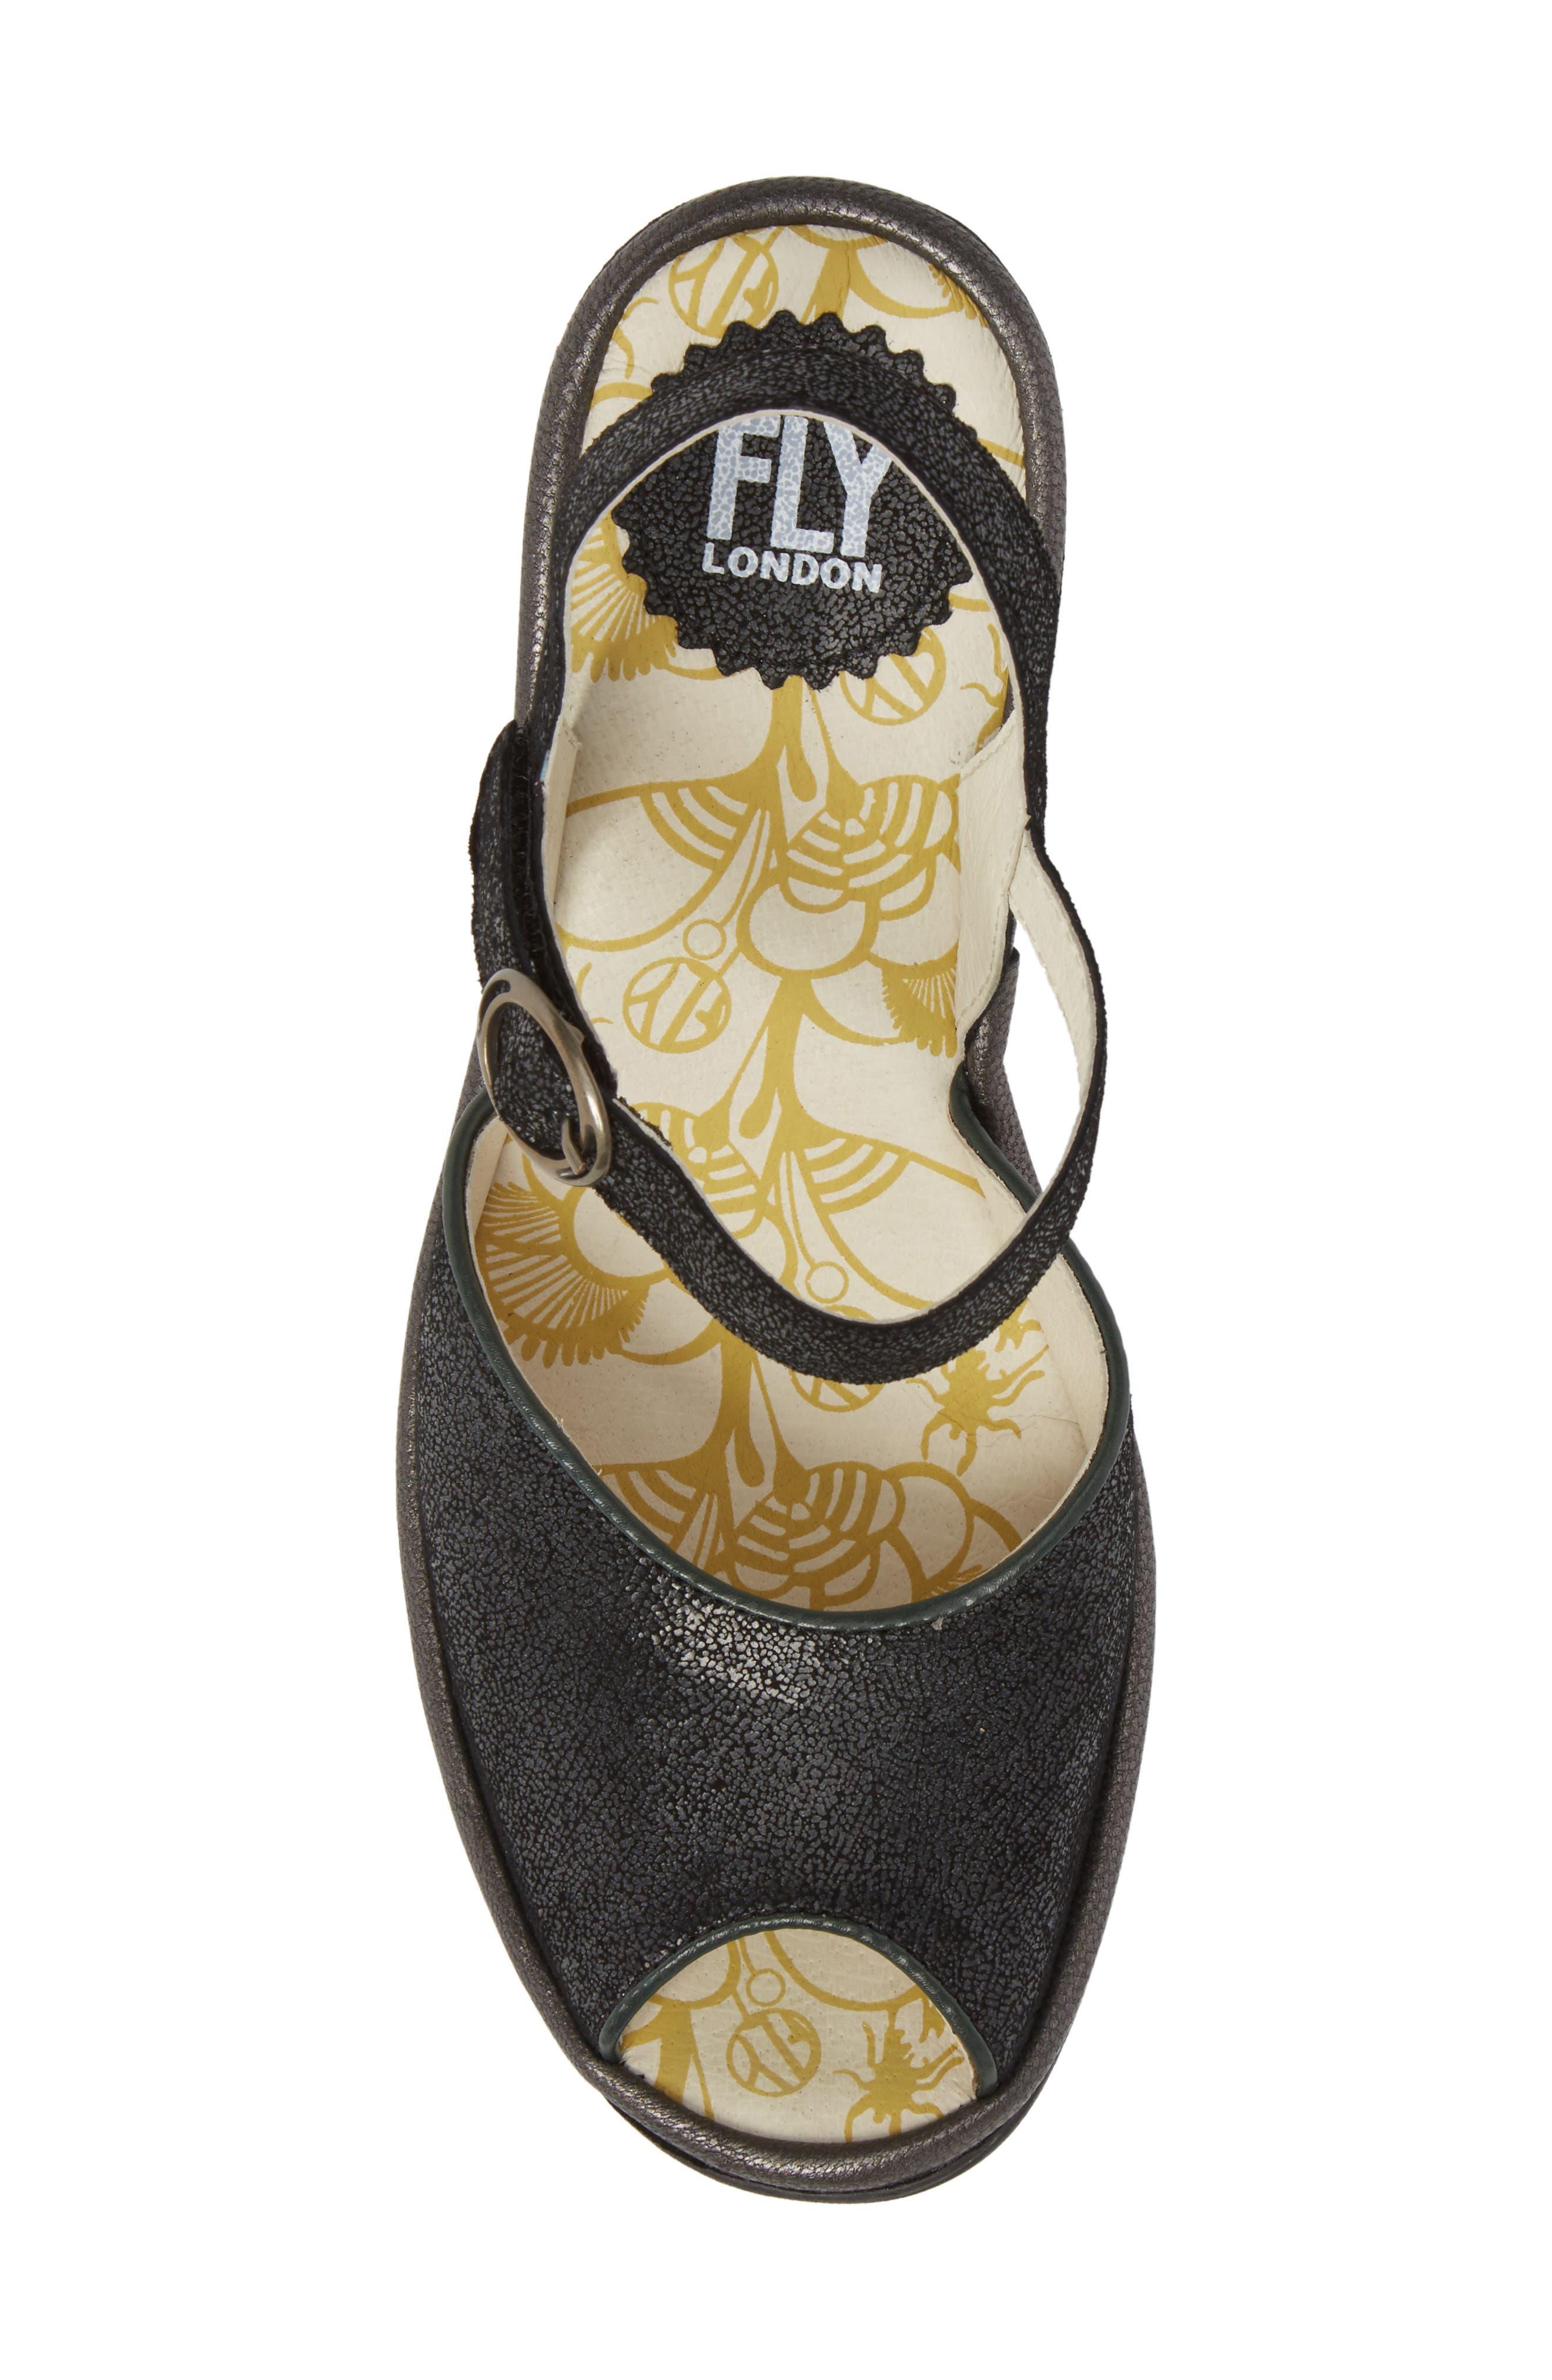 Yora Wedge Sandal,                             Alternate thumbnail 5, color,                             Black/ Graphite Leather